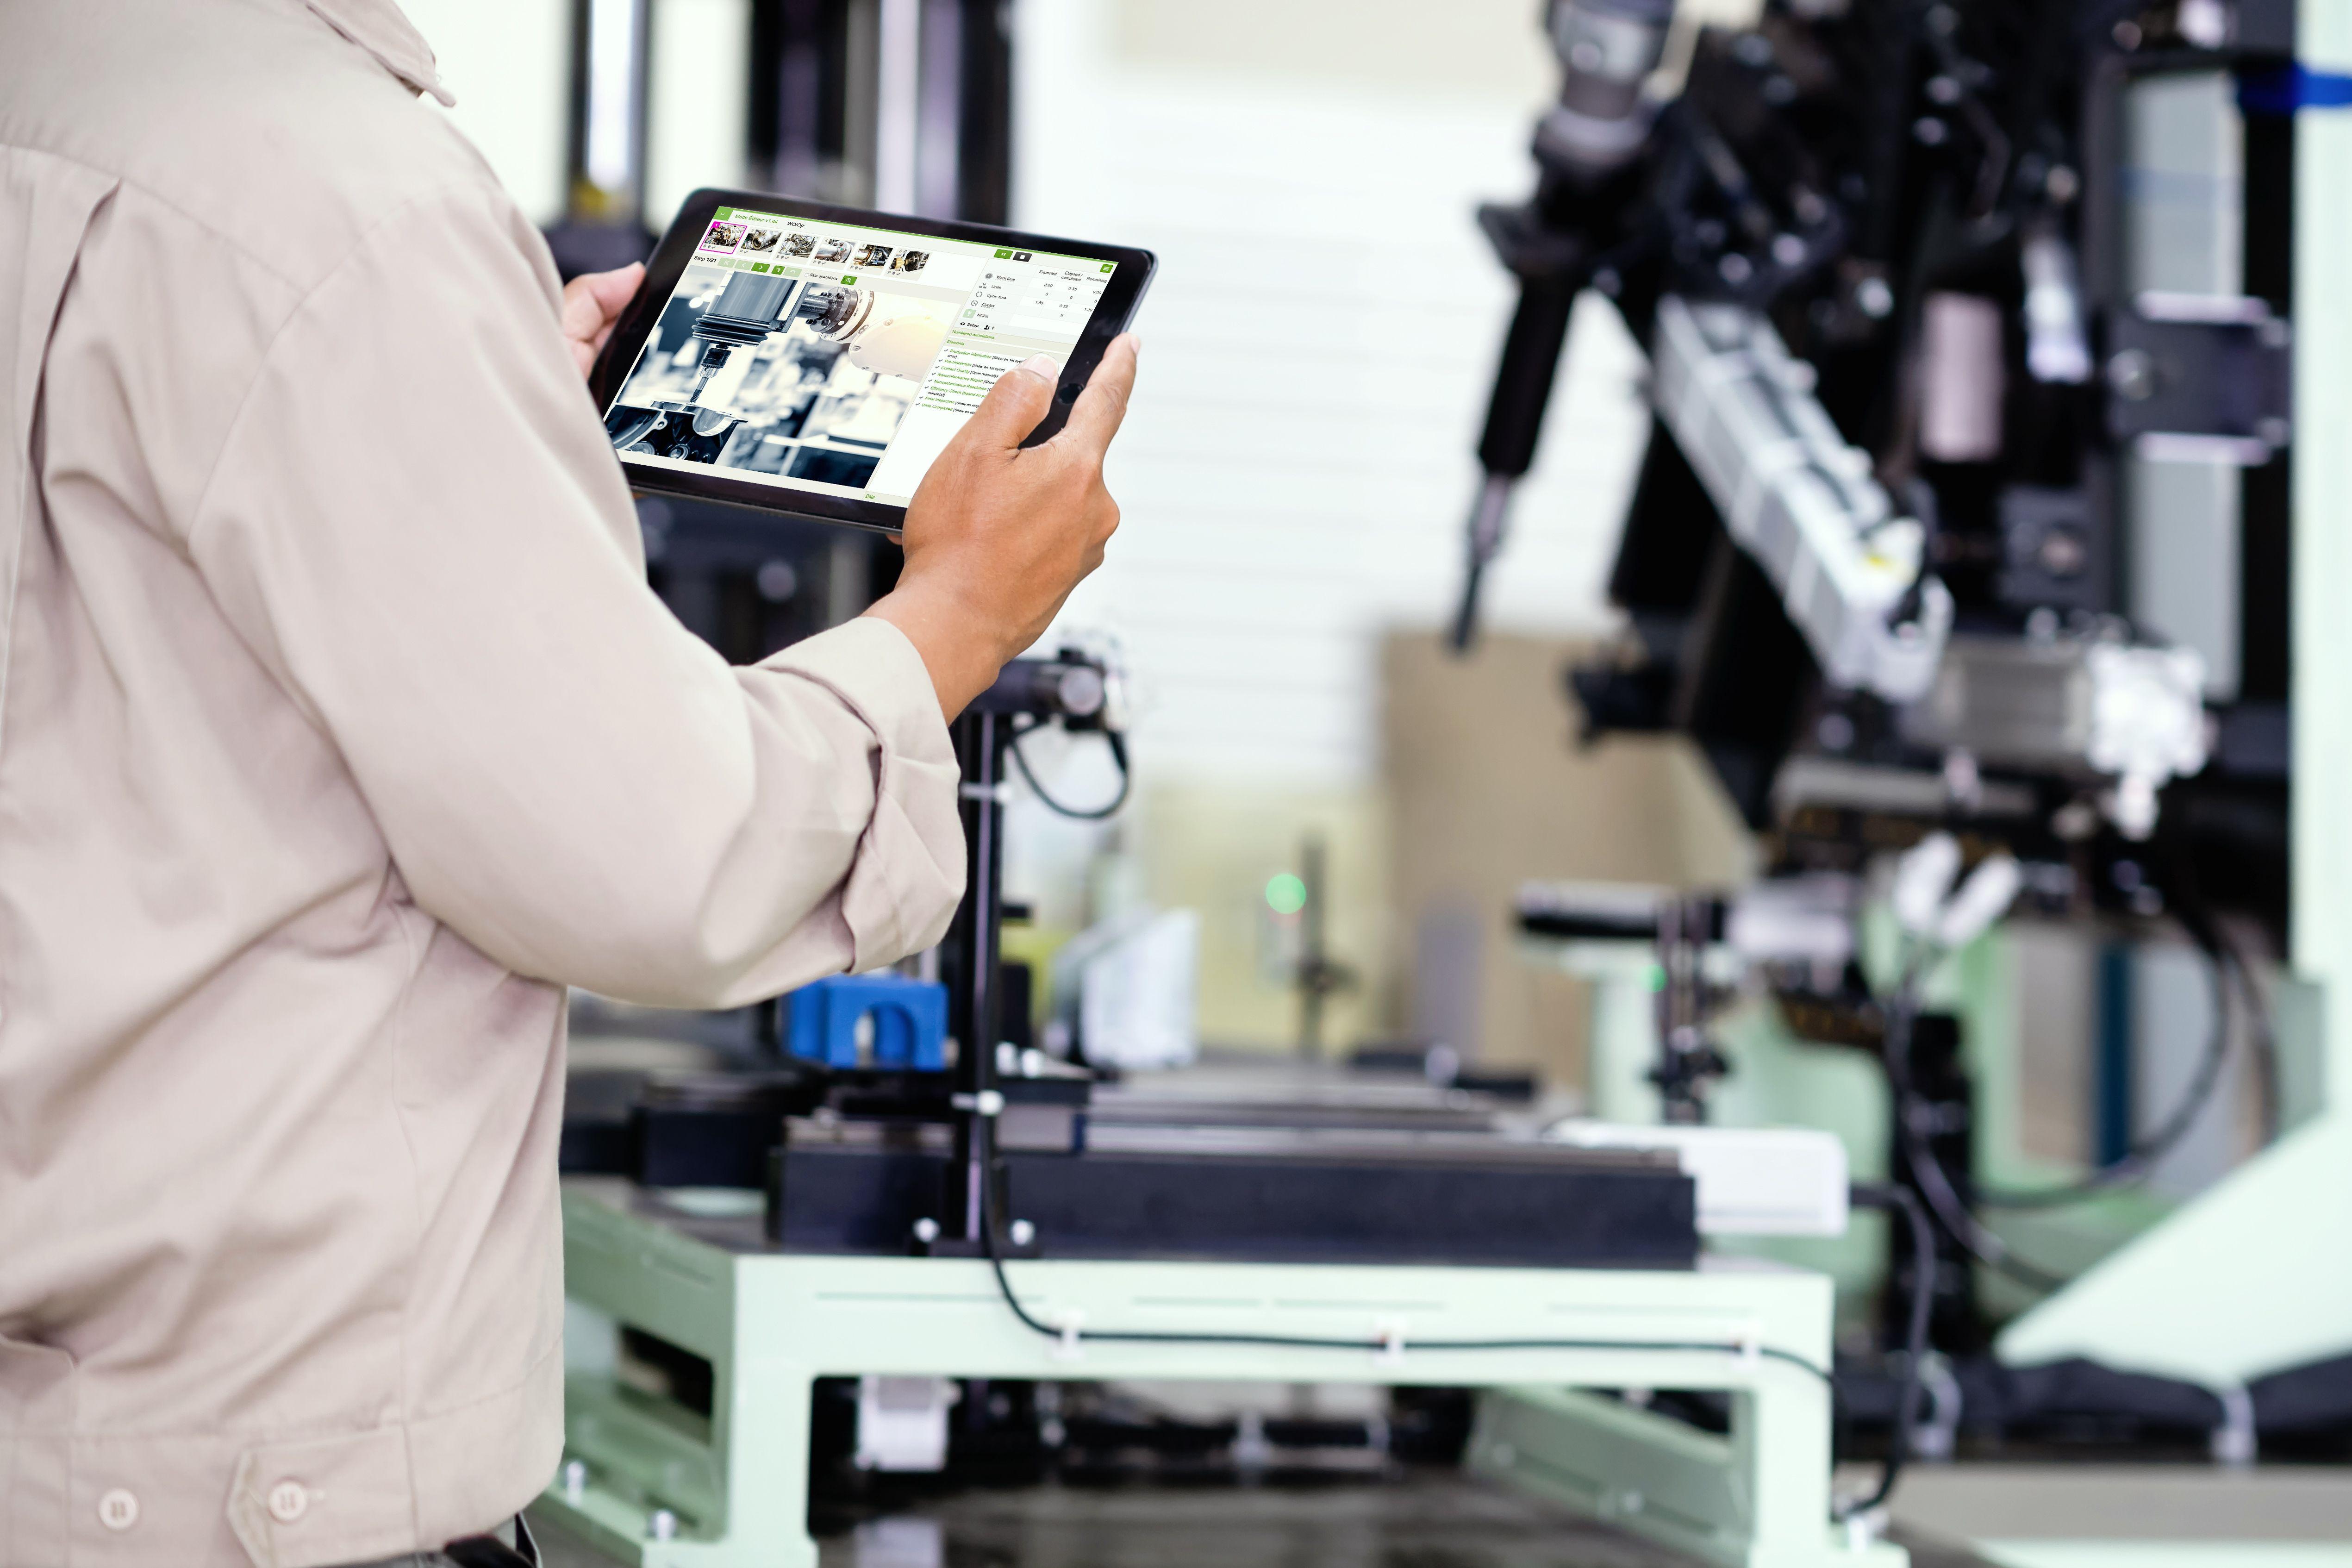 Manager mit Tablet in der Produktionsabteilung